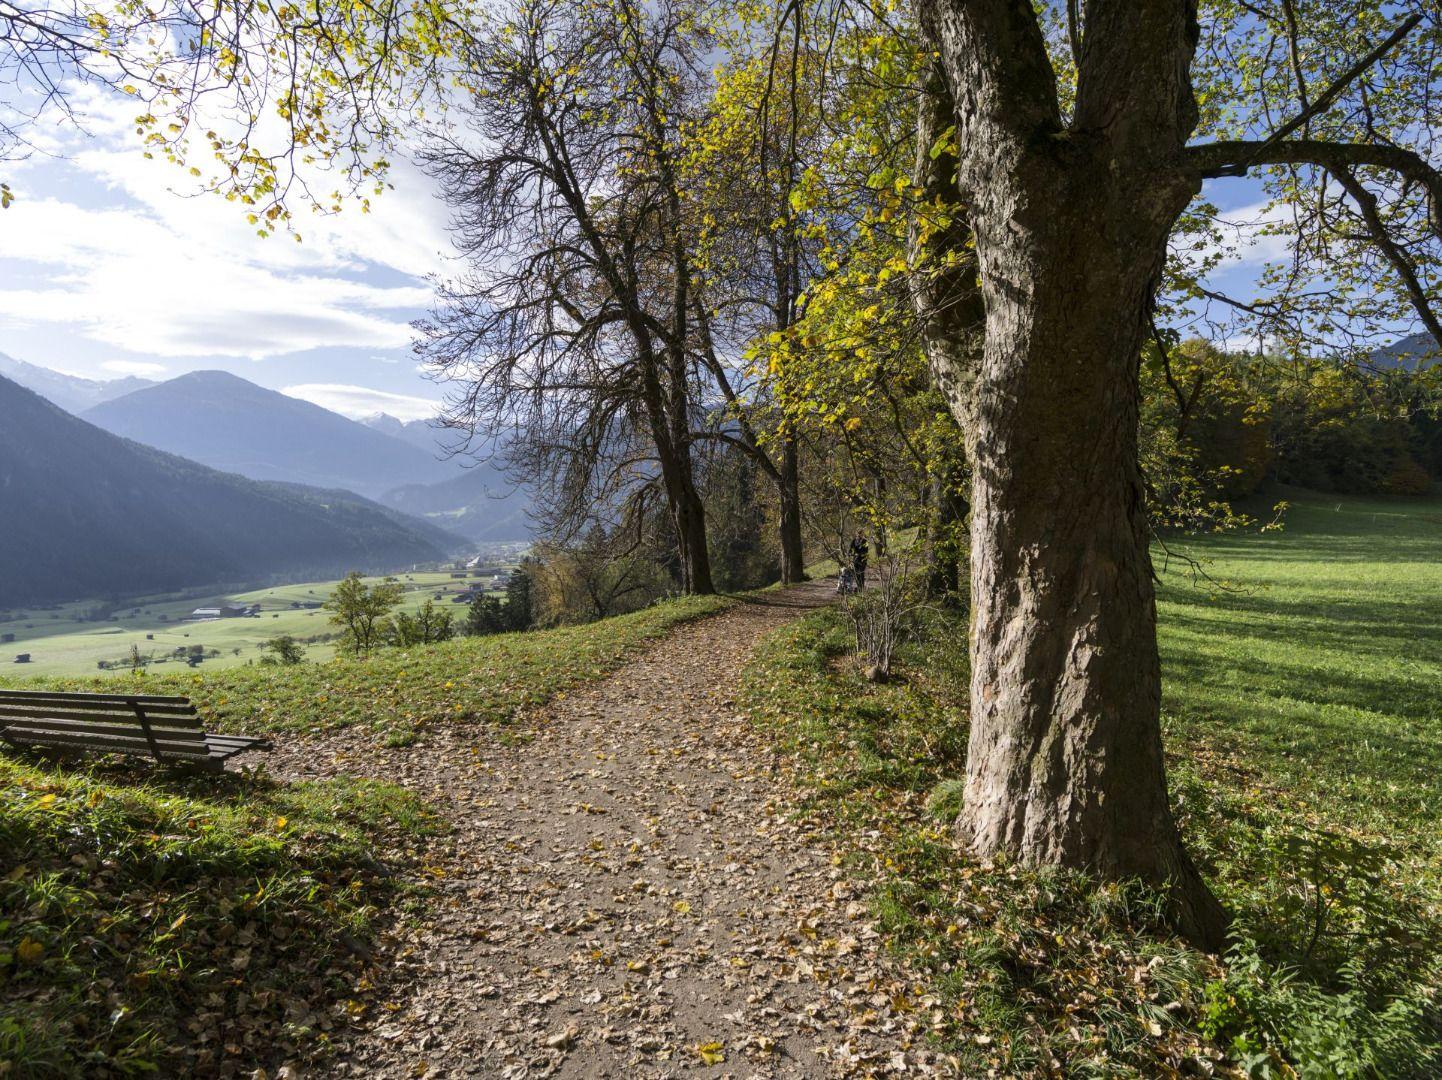 starkenberger_panoramaweg_etappe_4 (1).jpg